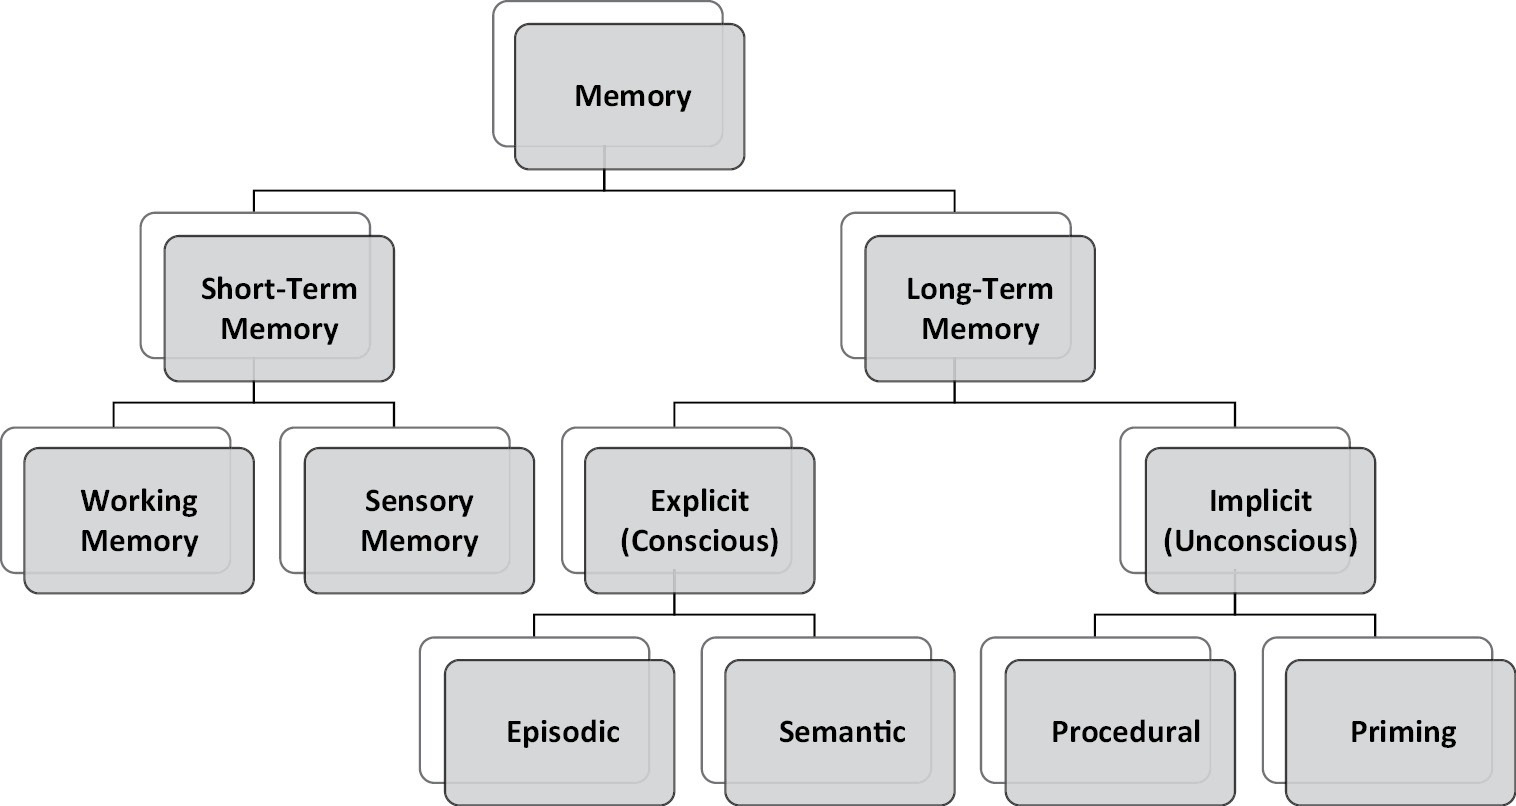 Evidence Based Cognitive Rehabilitation Section 1 Cognitive Rehabilitation For Pediatric Neurological Disorders